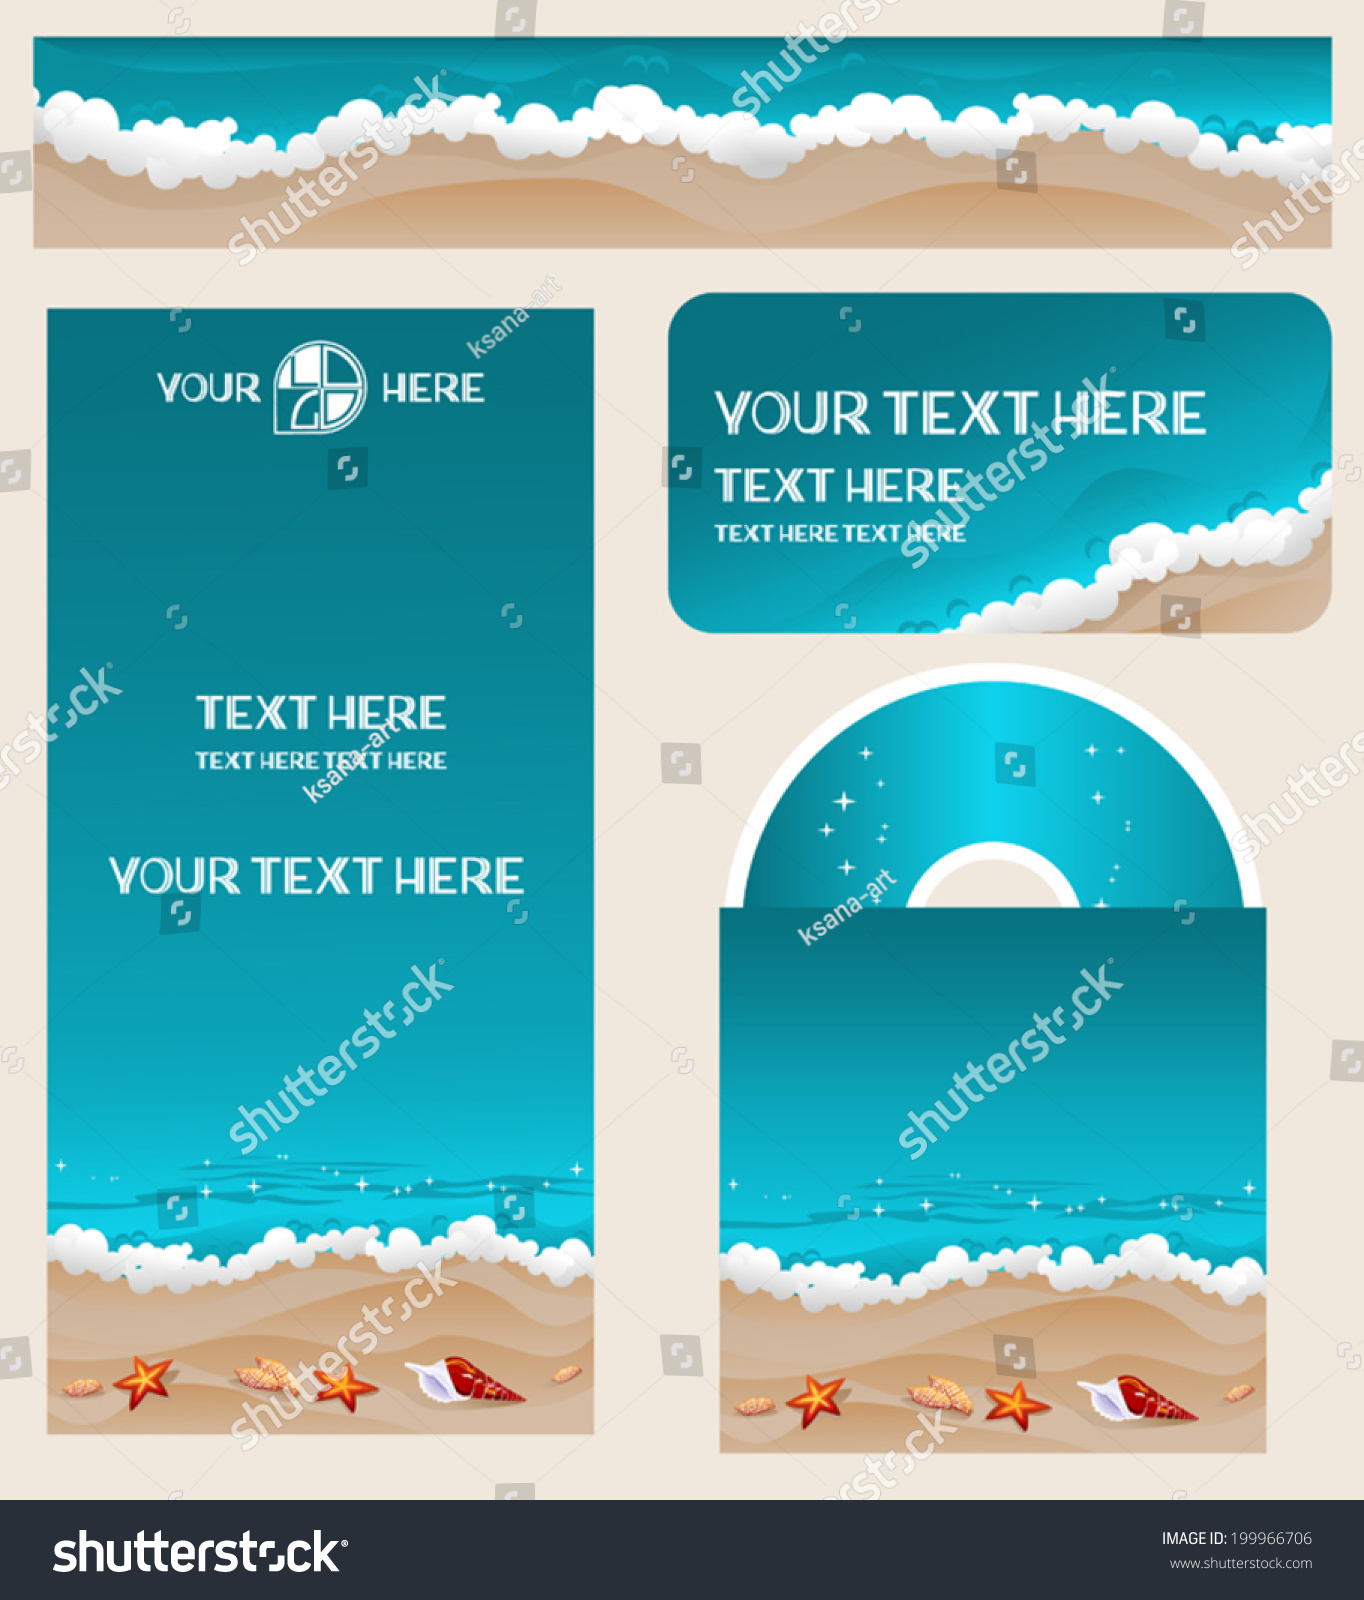 branding design travel agency vacation theme stock vector